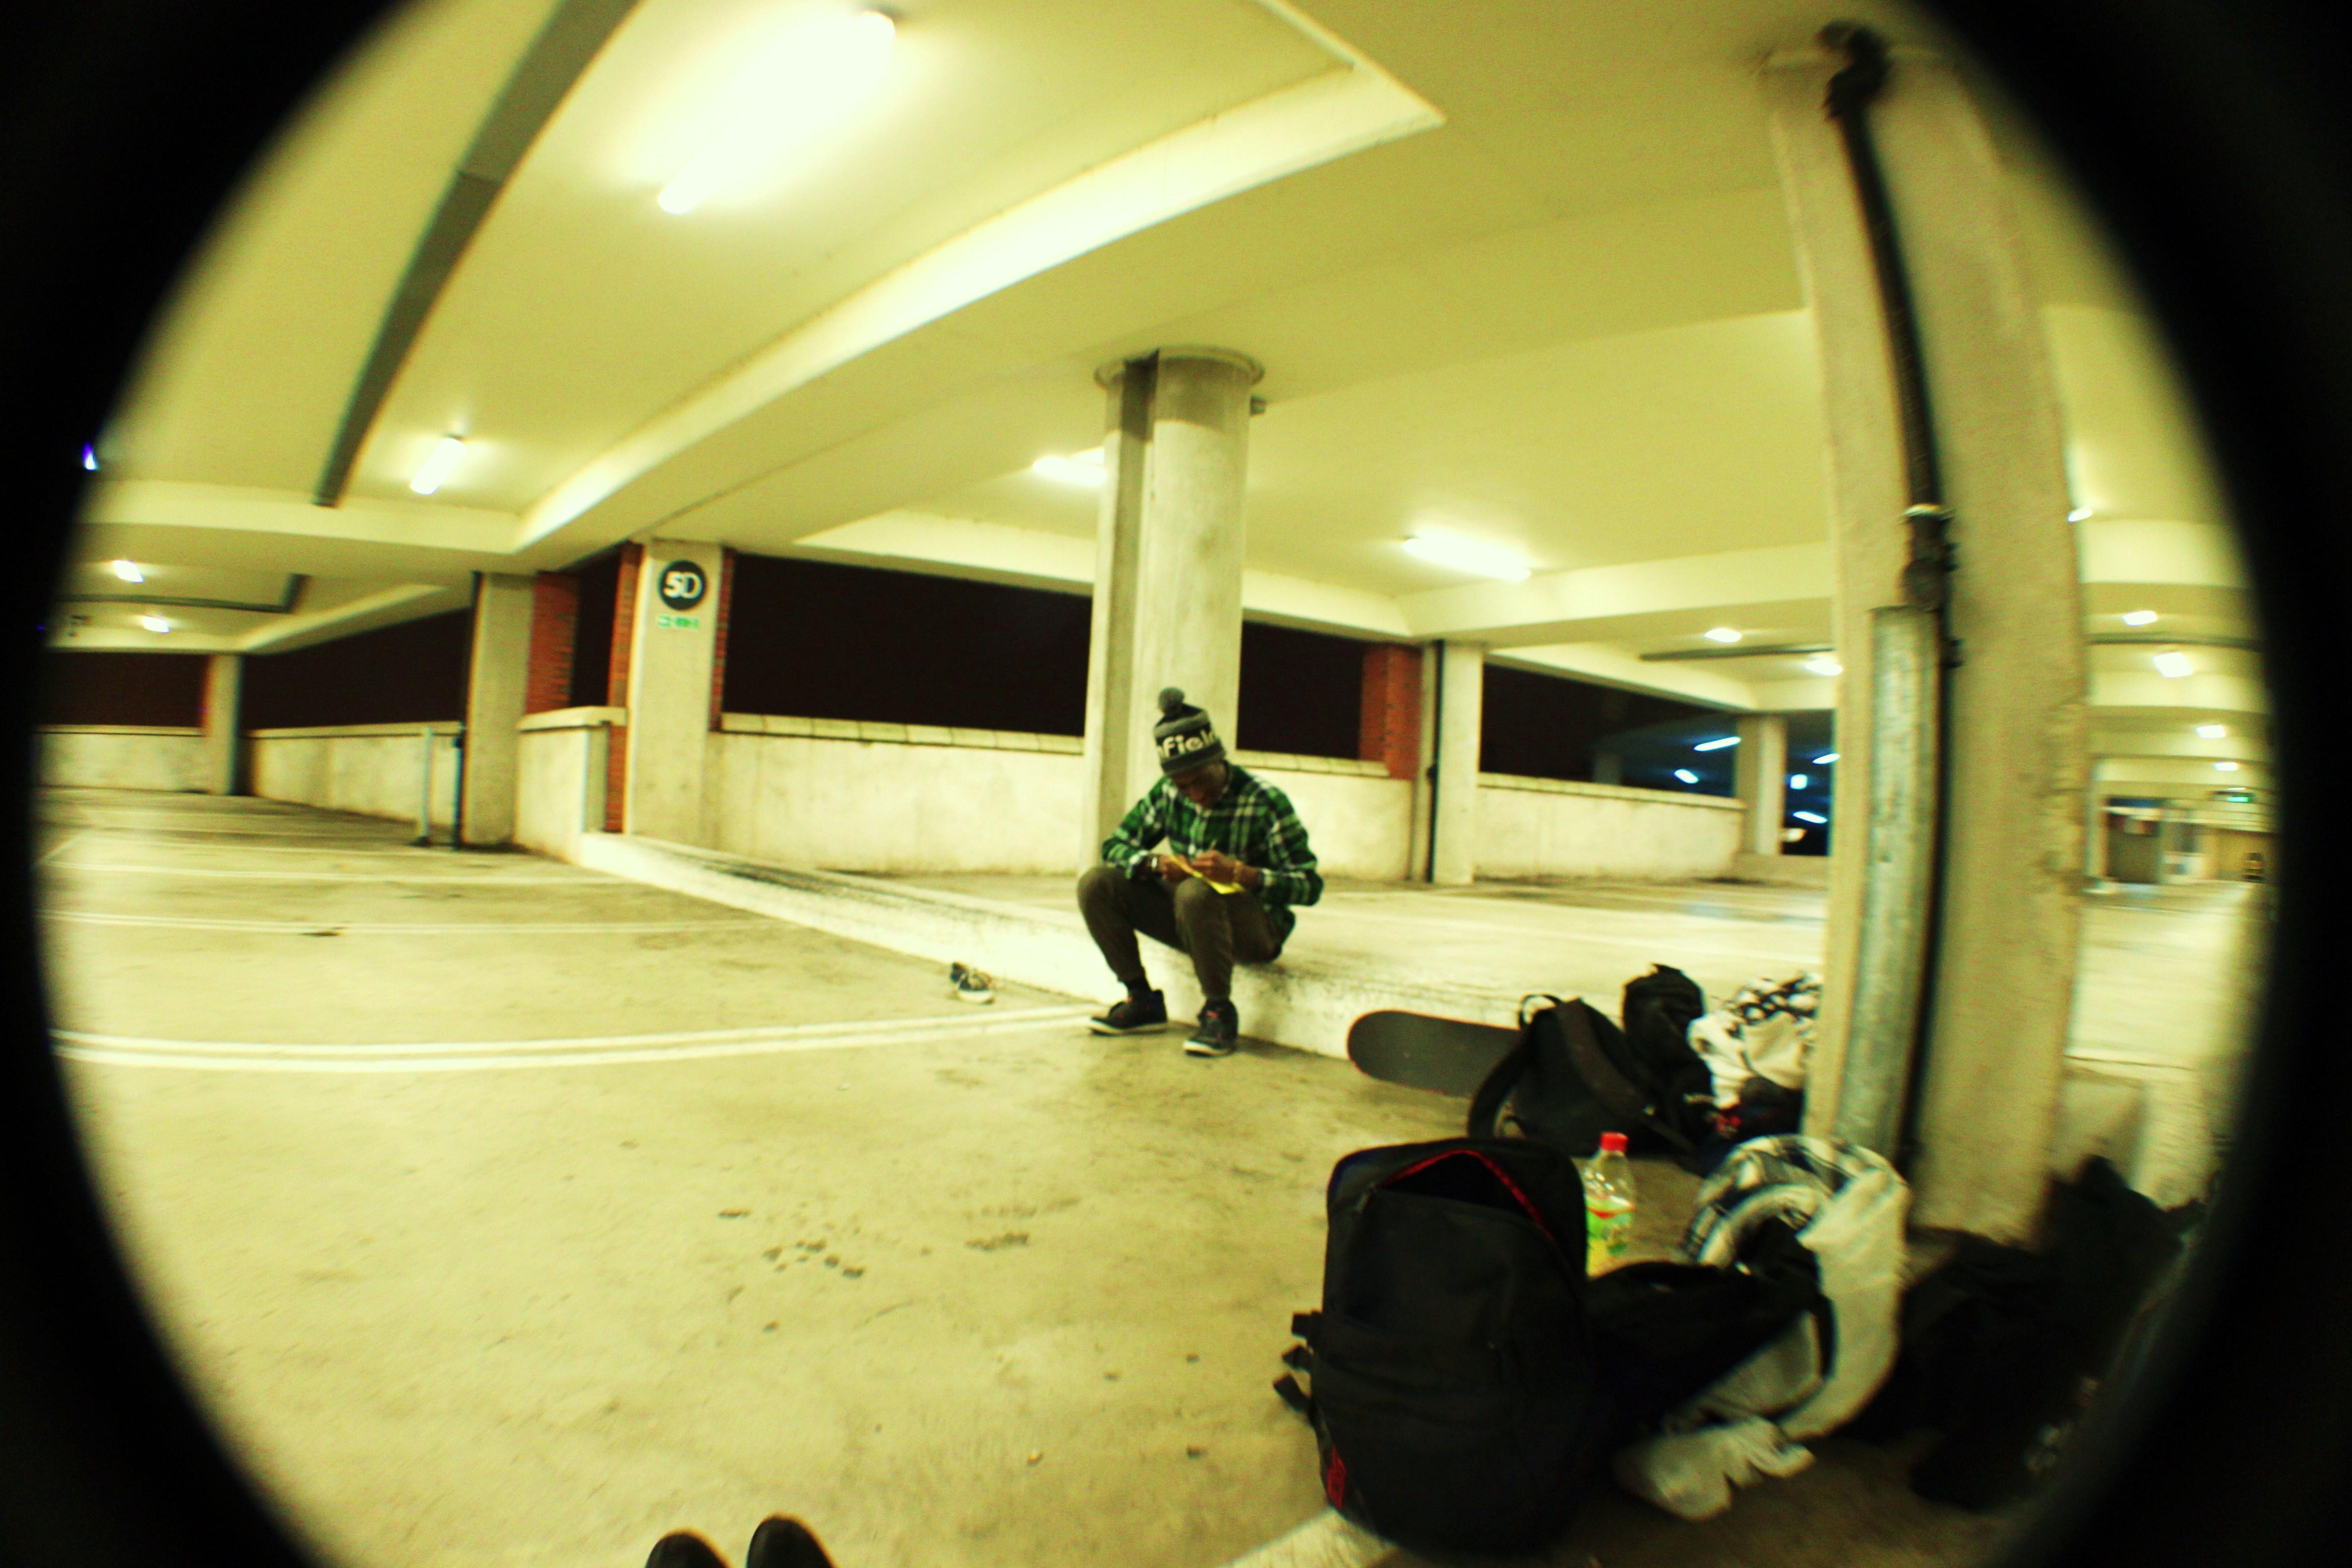 'Flatspots' 2012